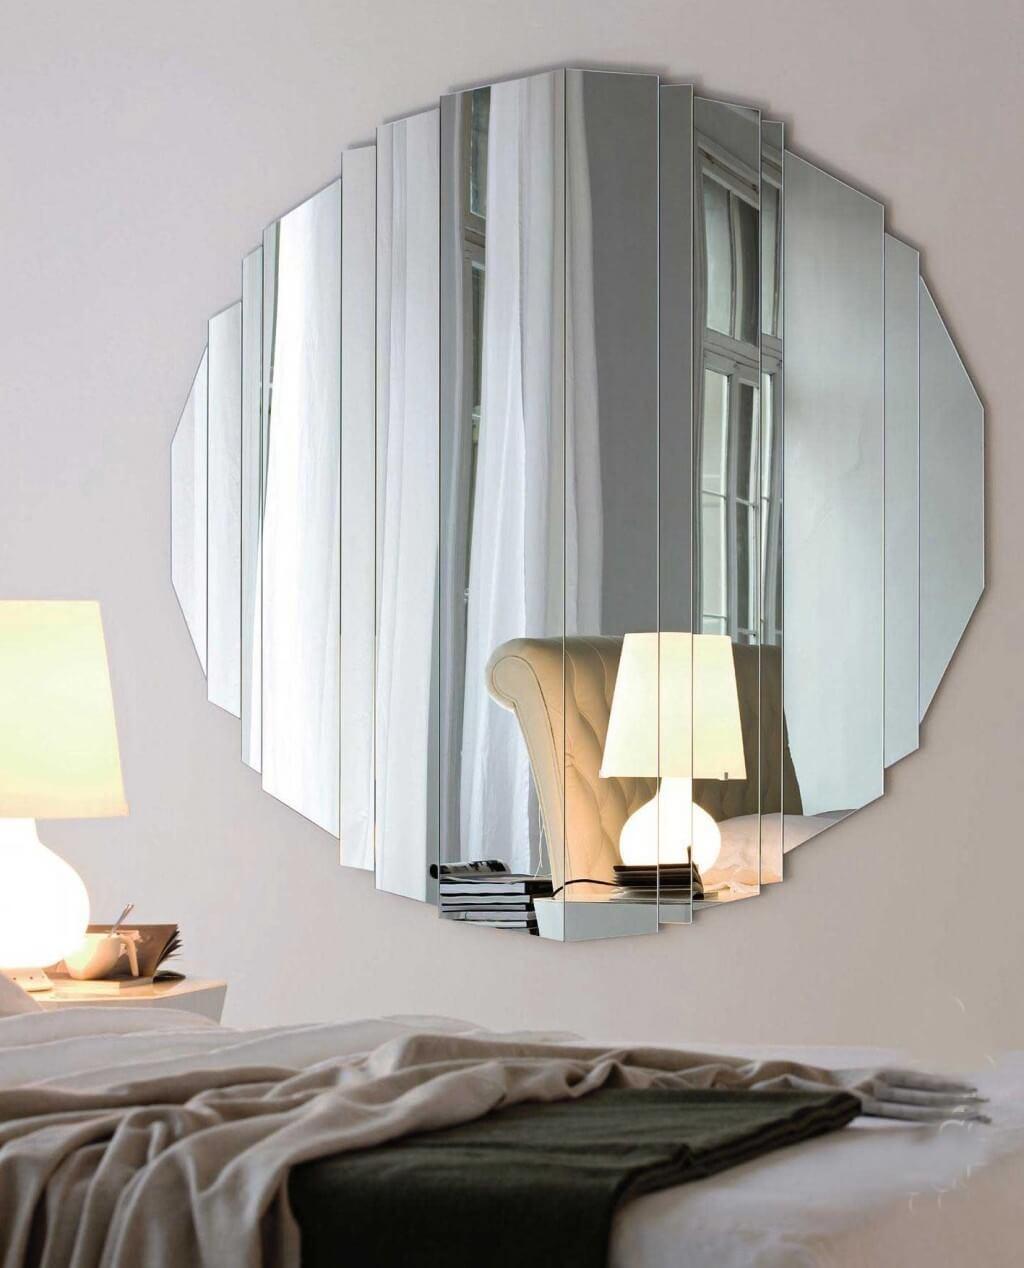 Beauty Round Mirror Wall Decor | Jeffsbakery Basement & Mattress Inside Large Modern Mirror (View 20 of 20)